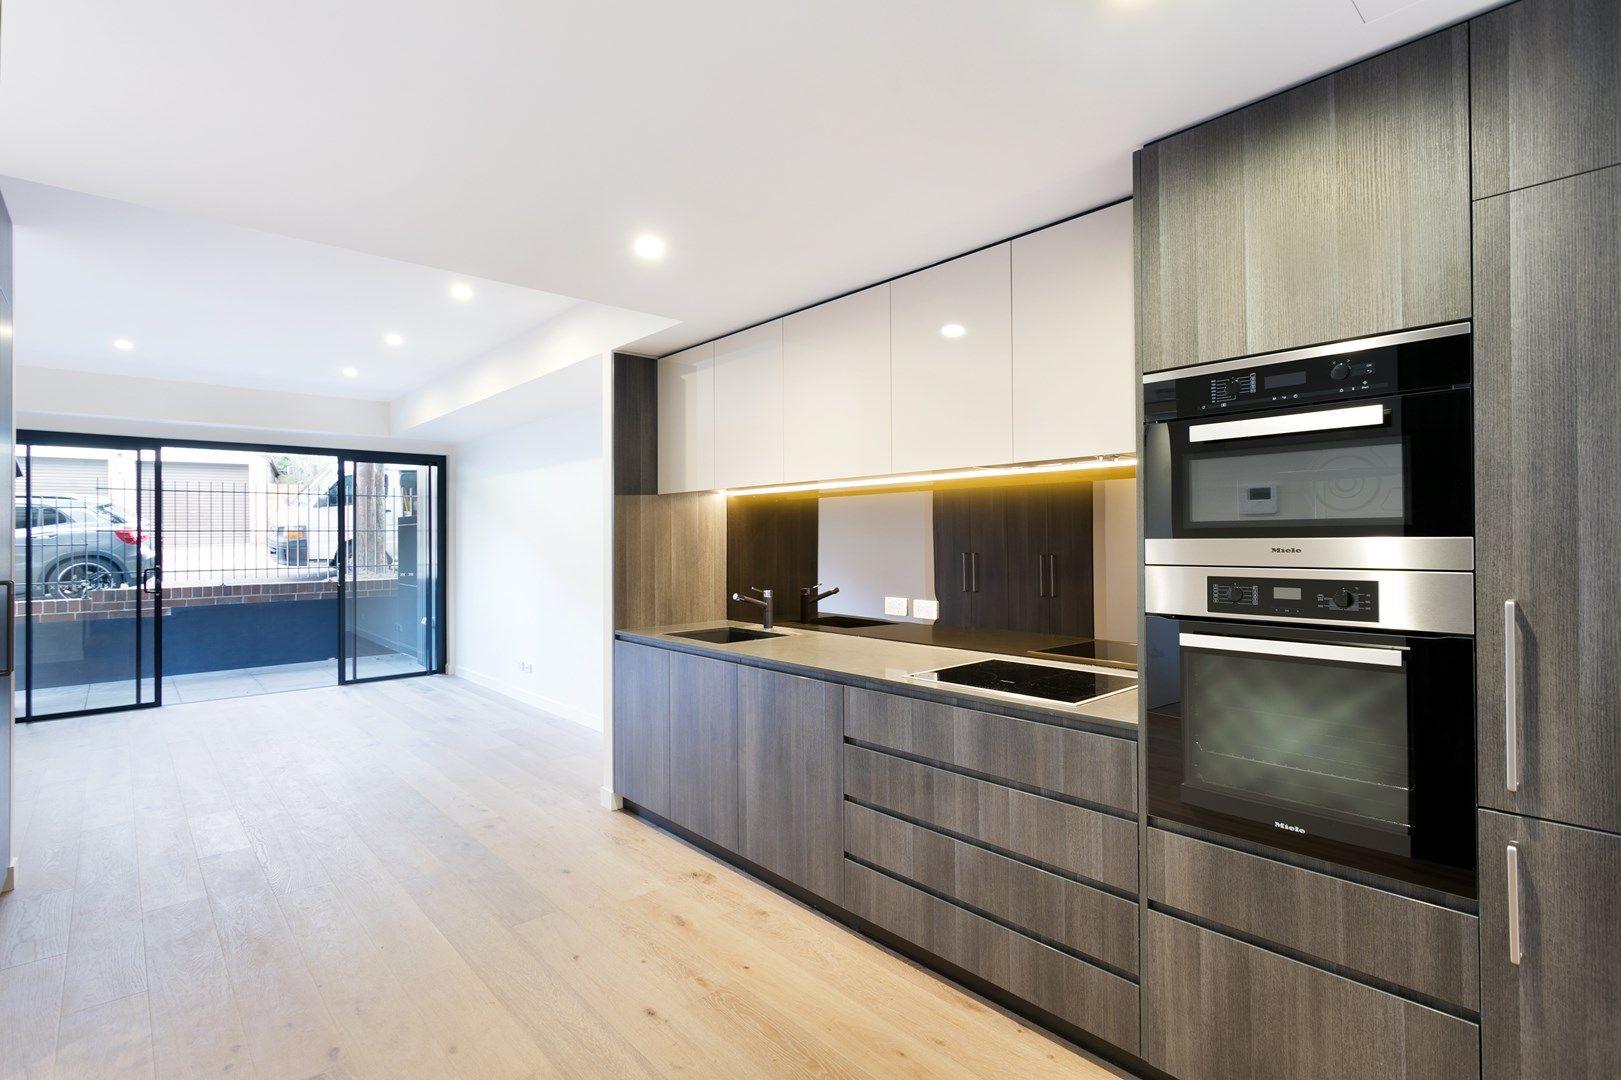 7/100 Reynolds Street, Balmain NSW 2041, Image 0